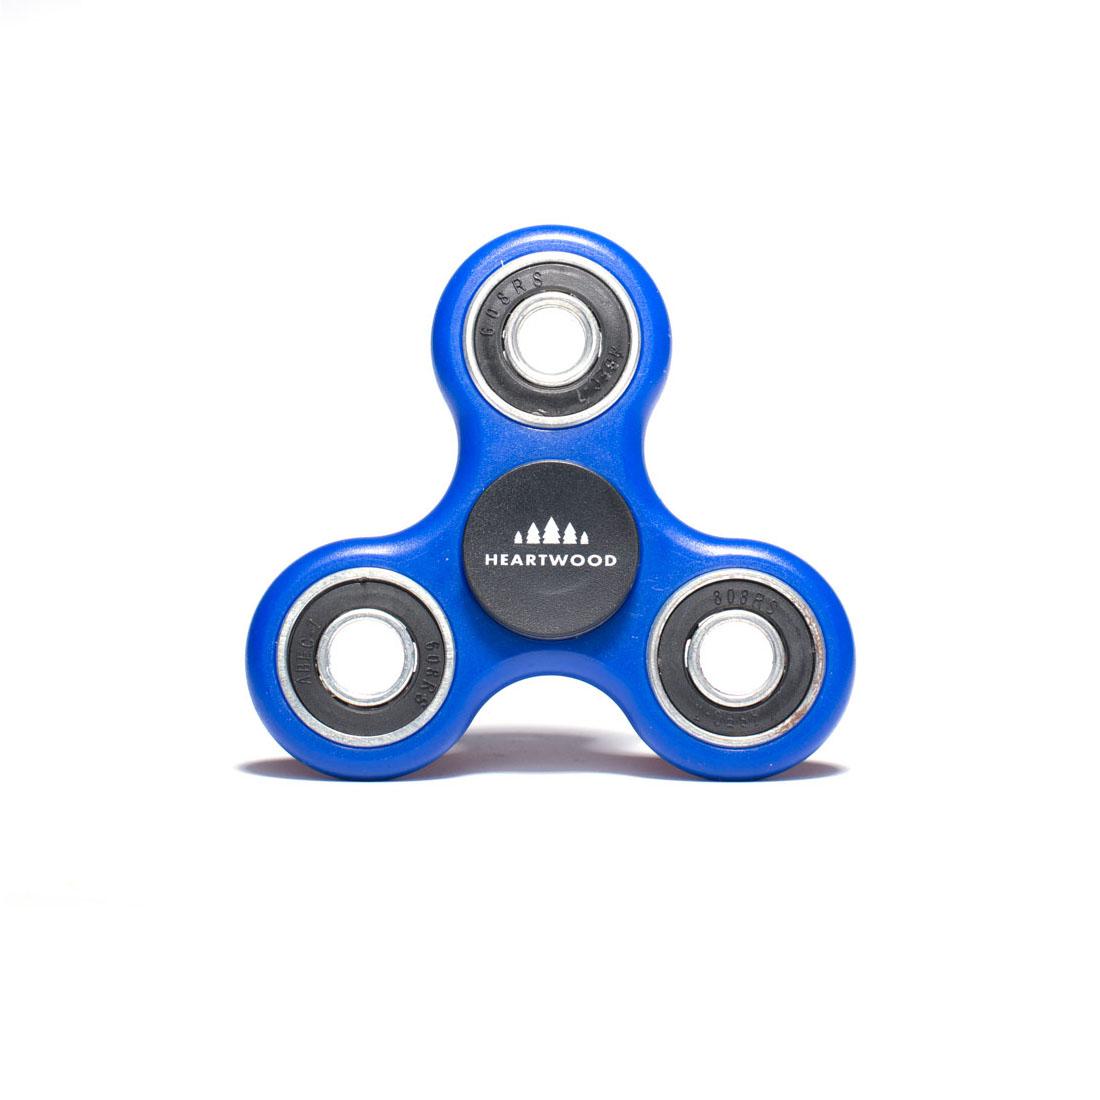 Heartwood Fidget Spinner Standard Blue